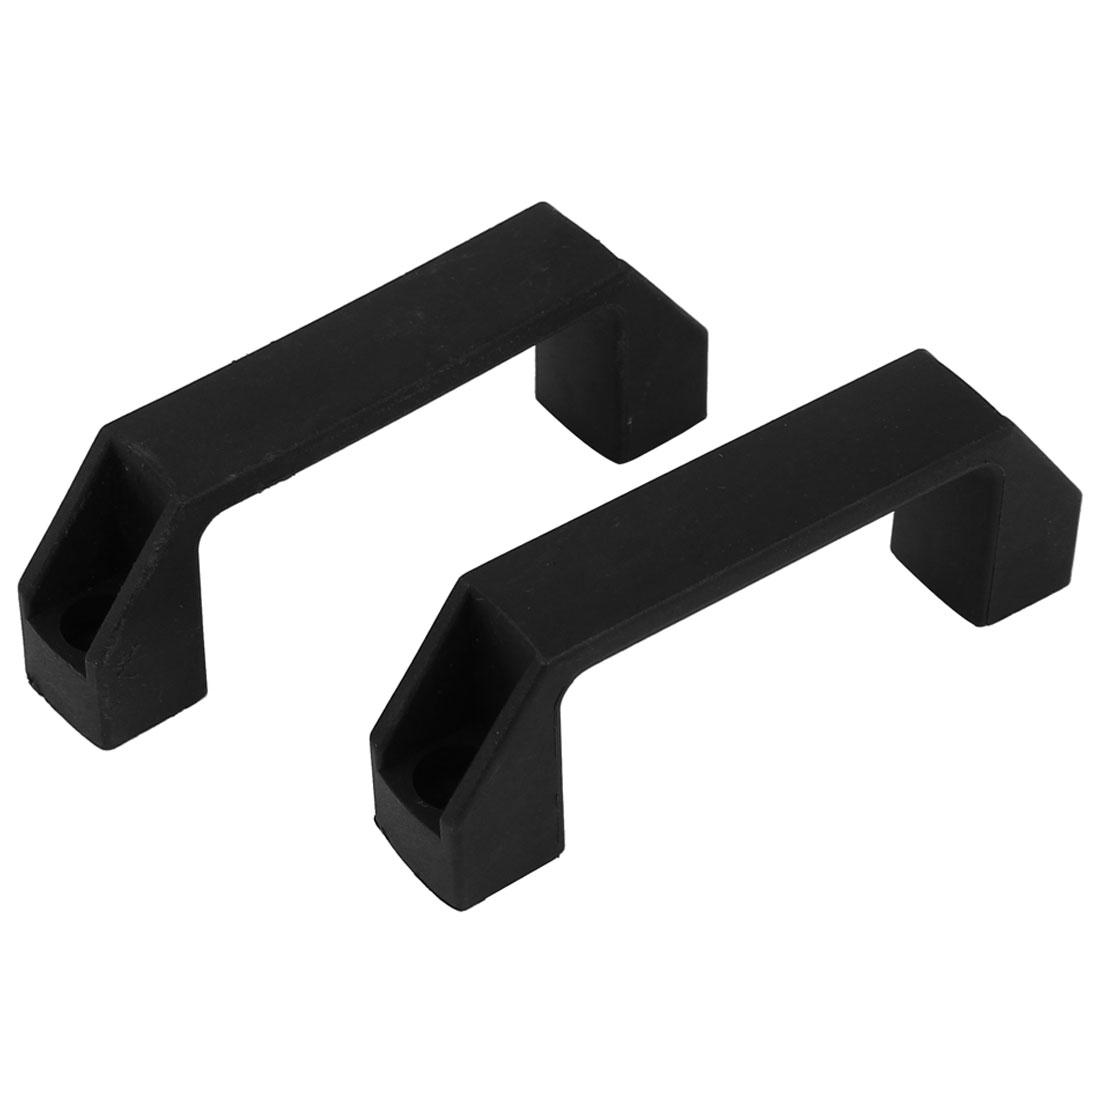 110mm Long Chest Box Plastic Pull Handle Black 2pcs